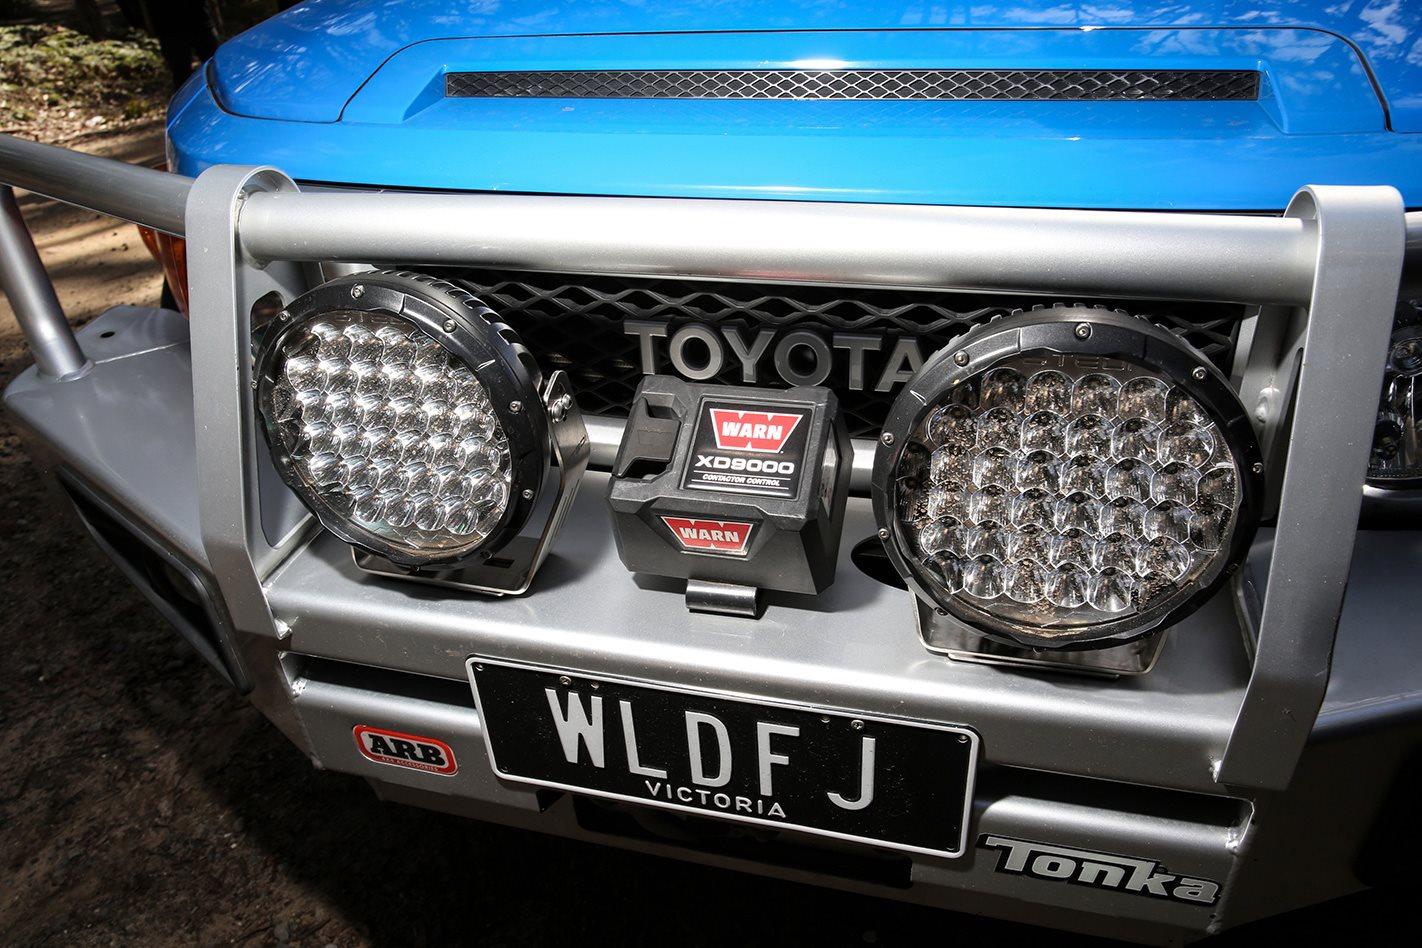 H4 LED headlight conversion